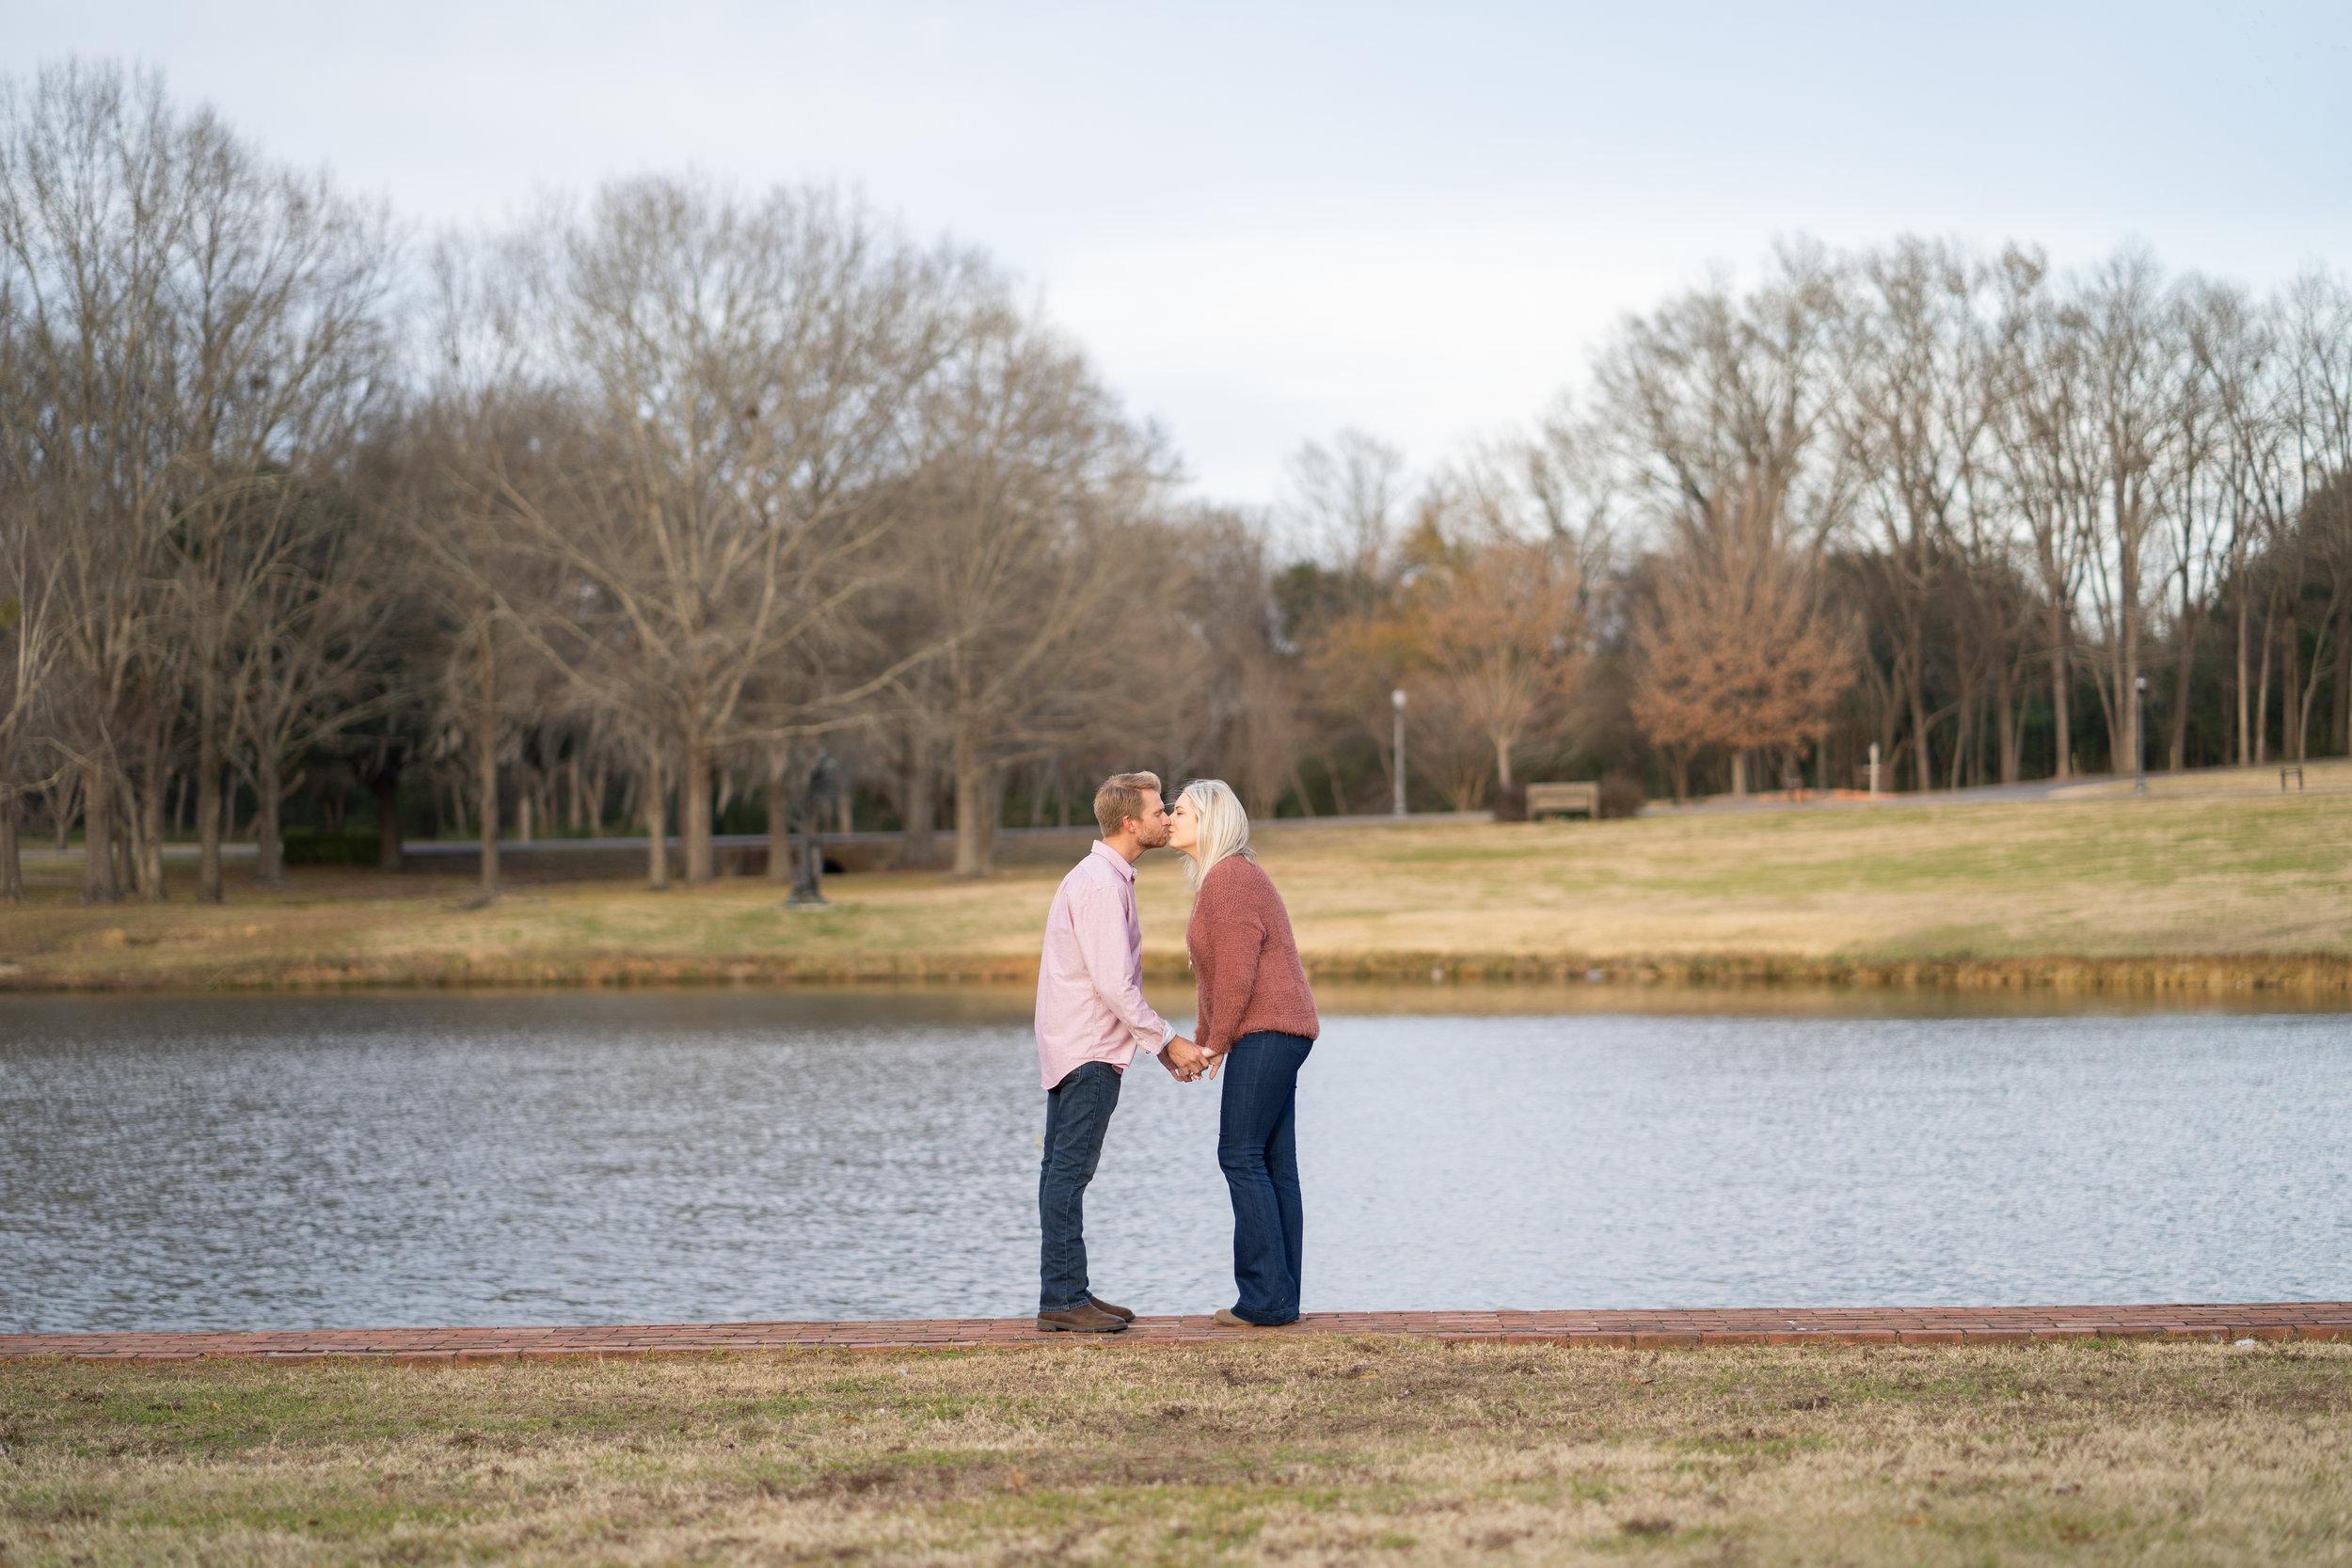 Alabama-Wedding-Photographer-Nick-Drollette-119.jpg